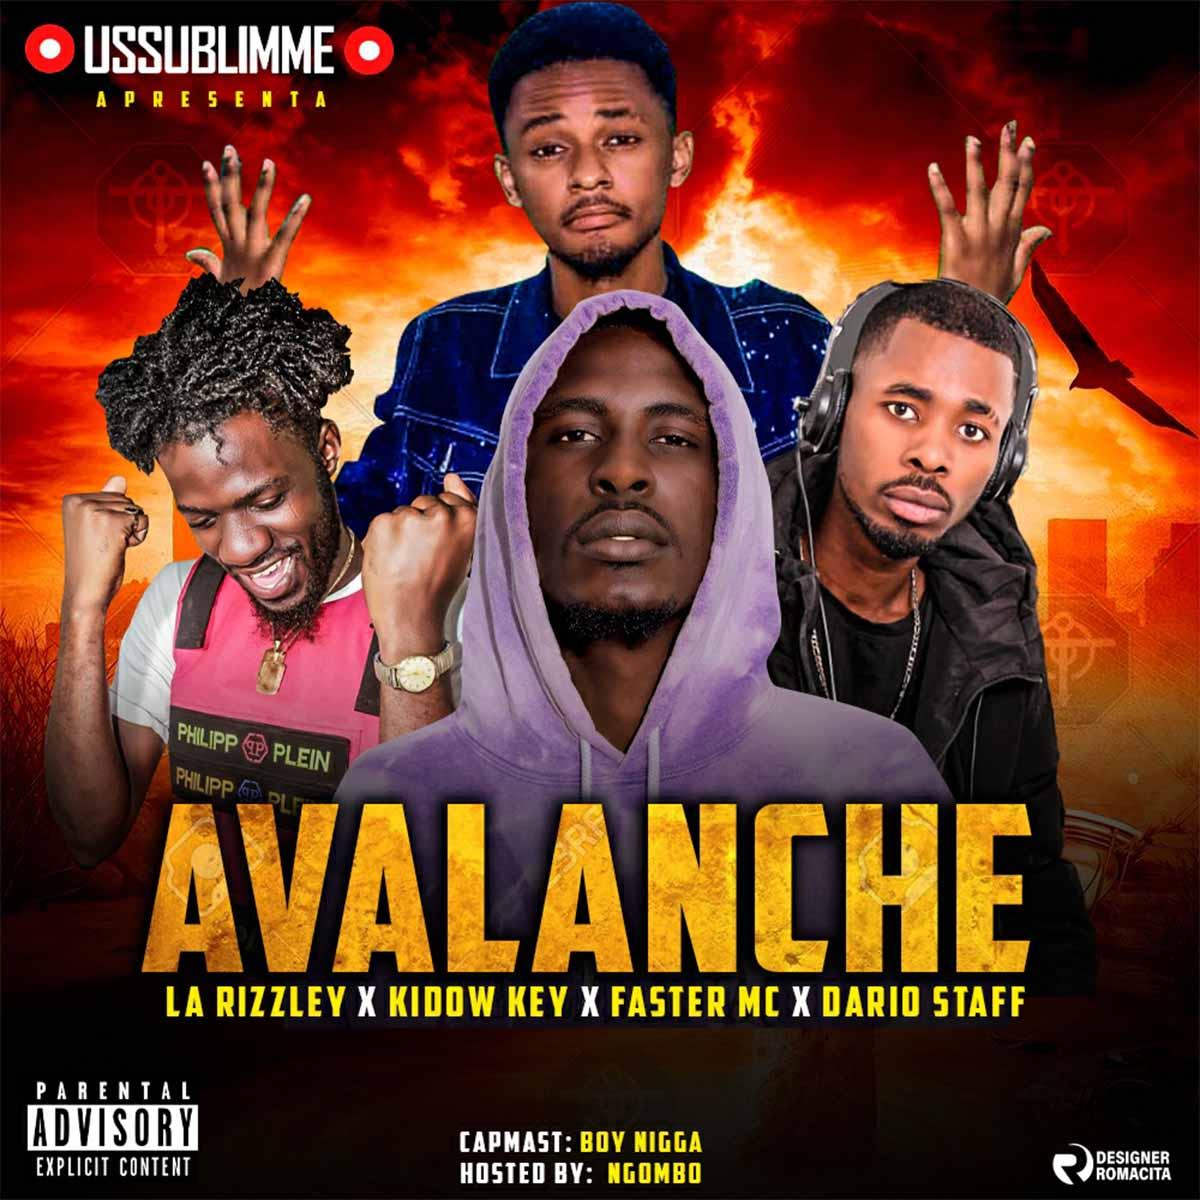 USSUBLIMME - Avalanche (Feat. LA Rizzley, Kidow Key, Faster MC & Dario Staff)